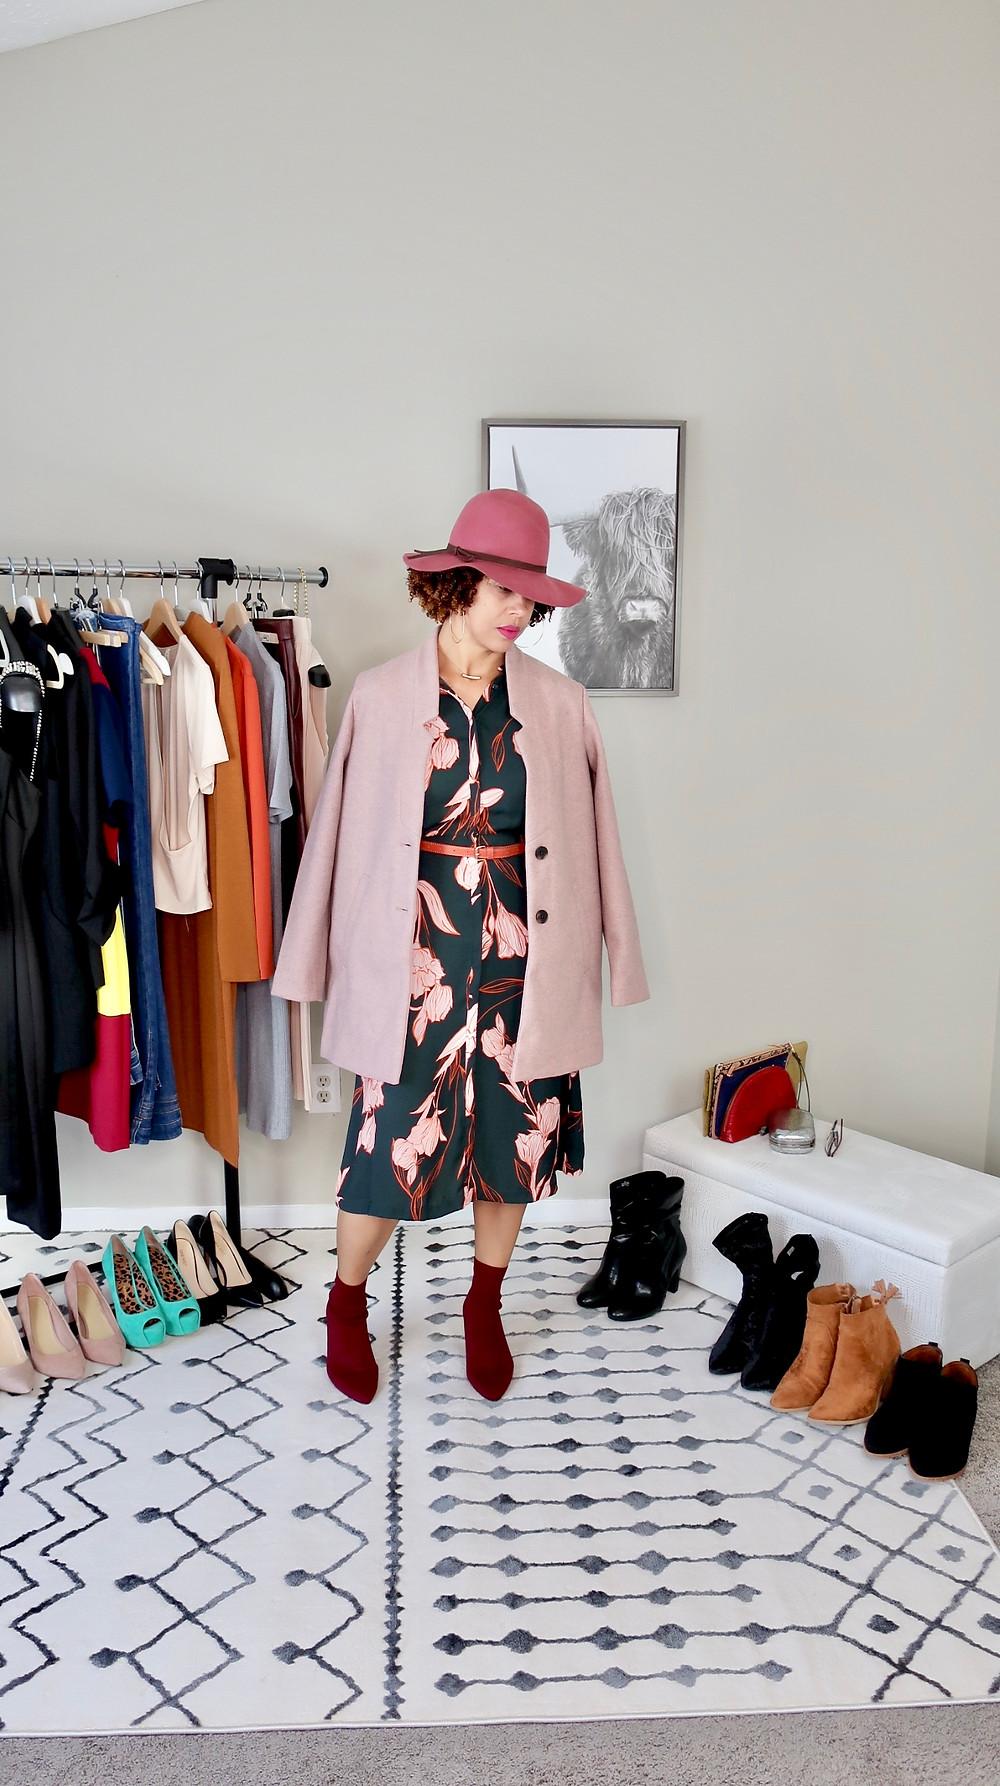 Blogger modeling a hat